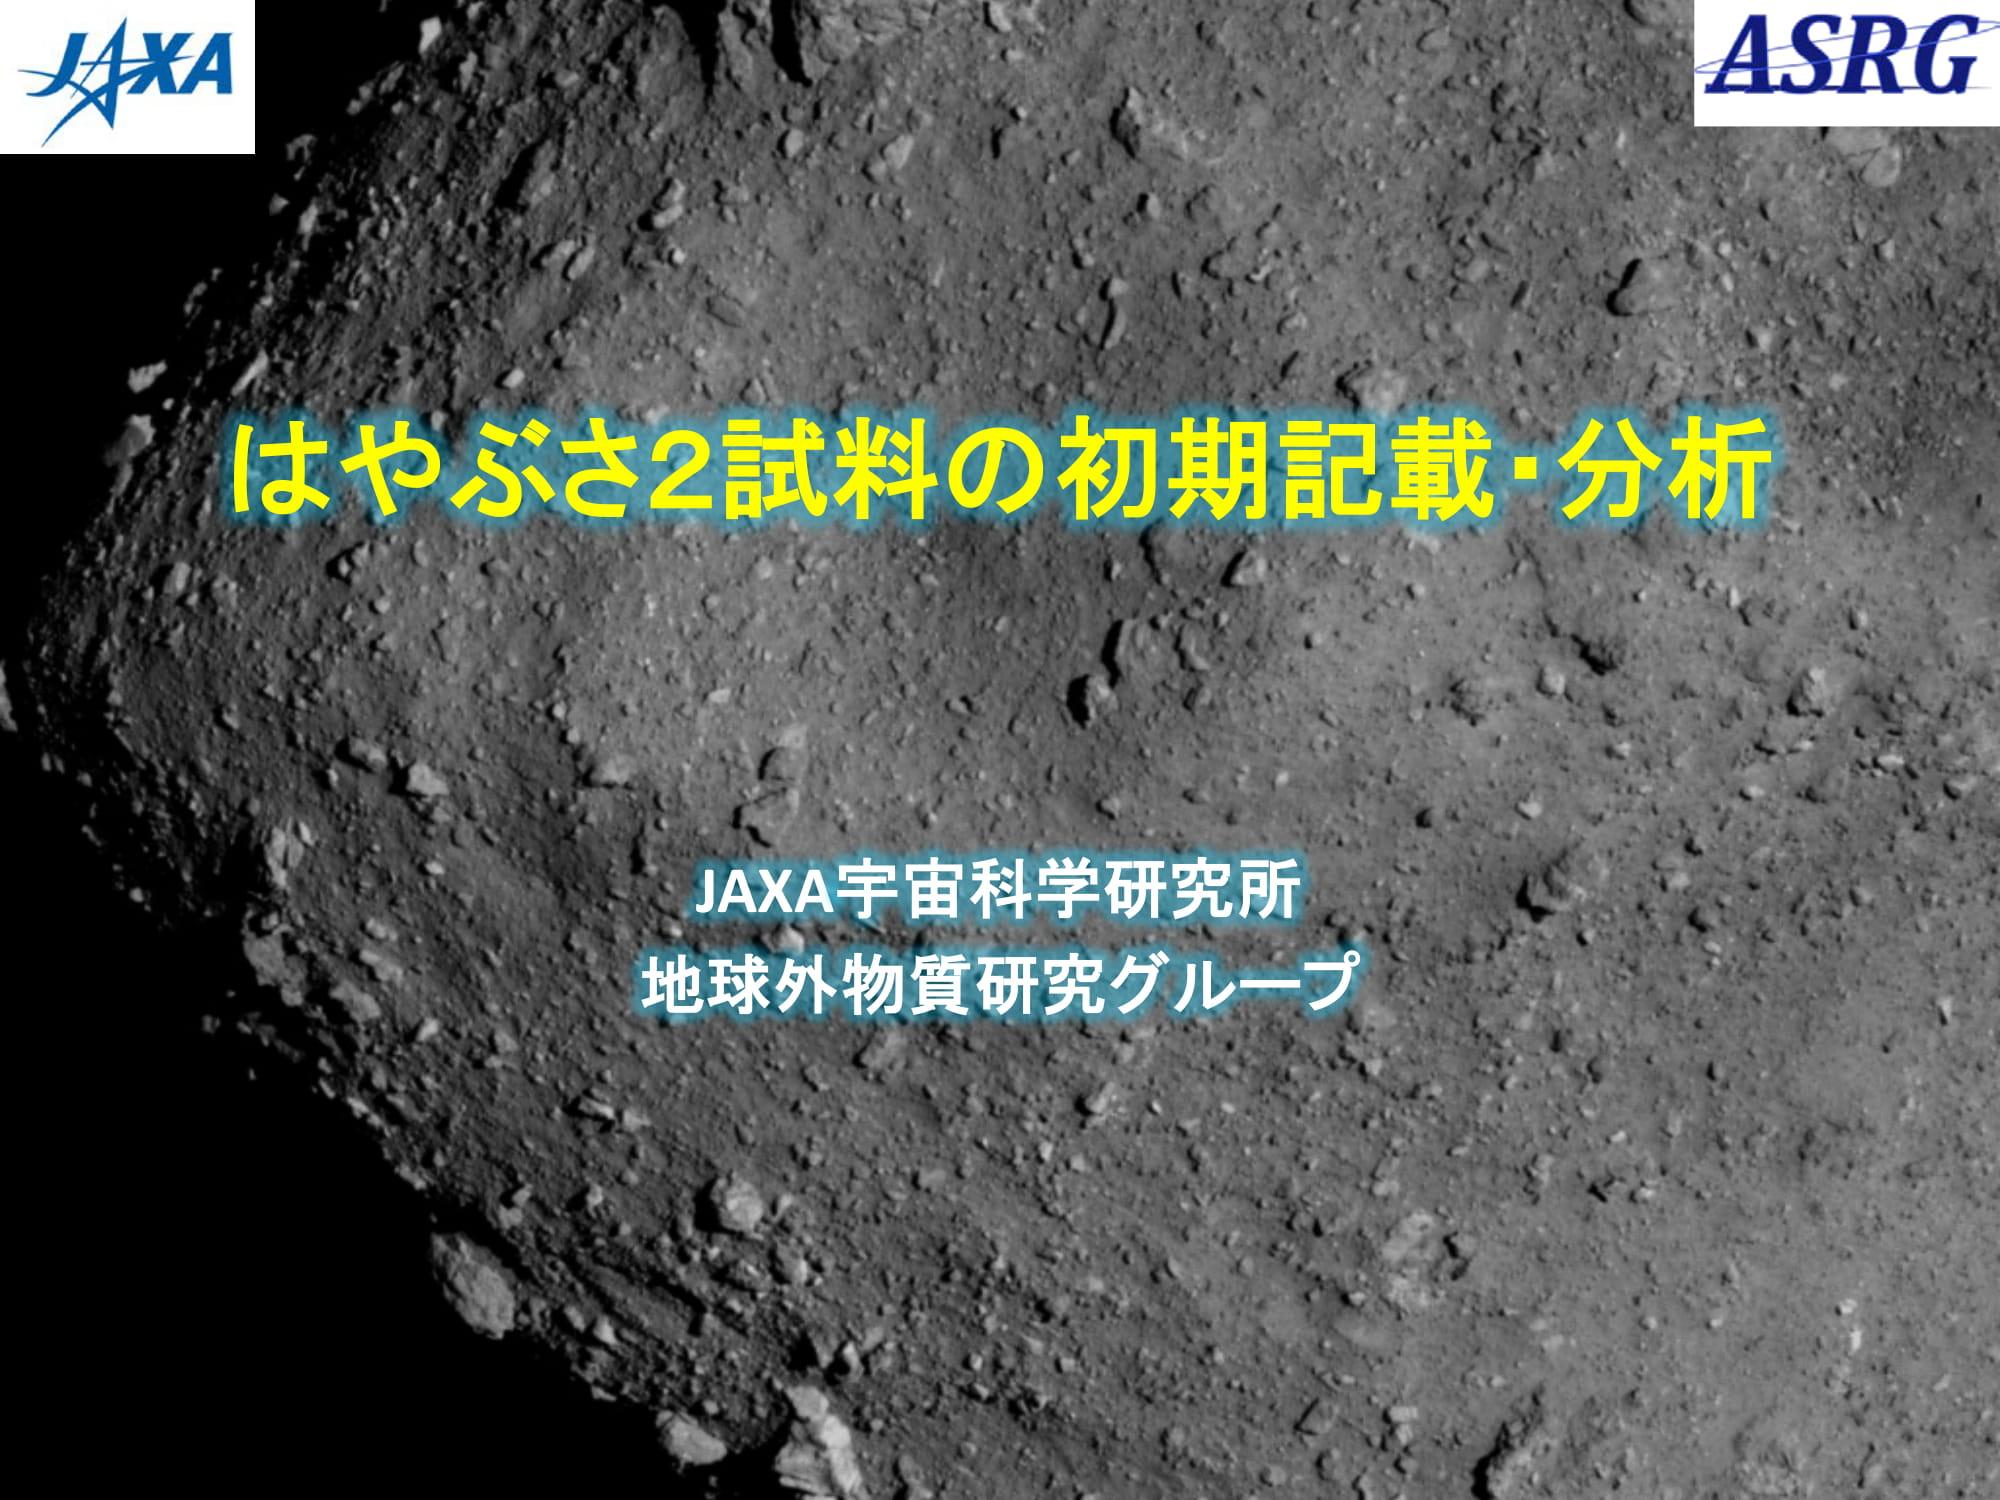 f:id:Imamura:20201208123013j:plain